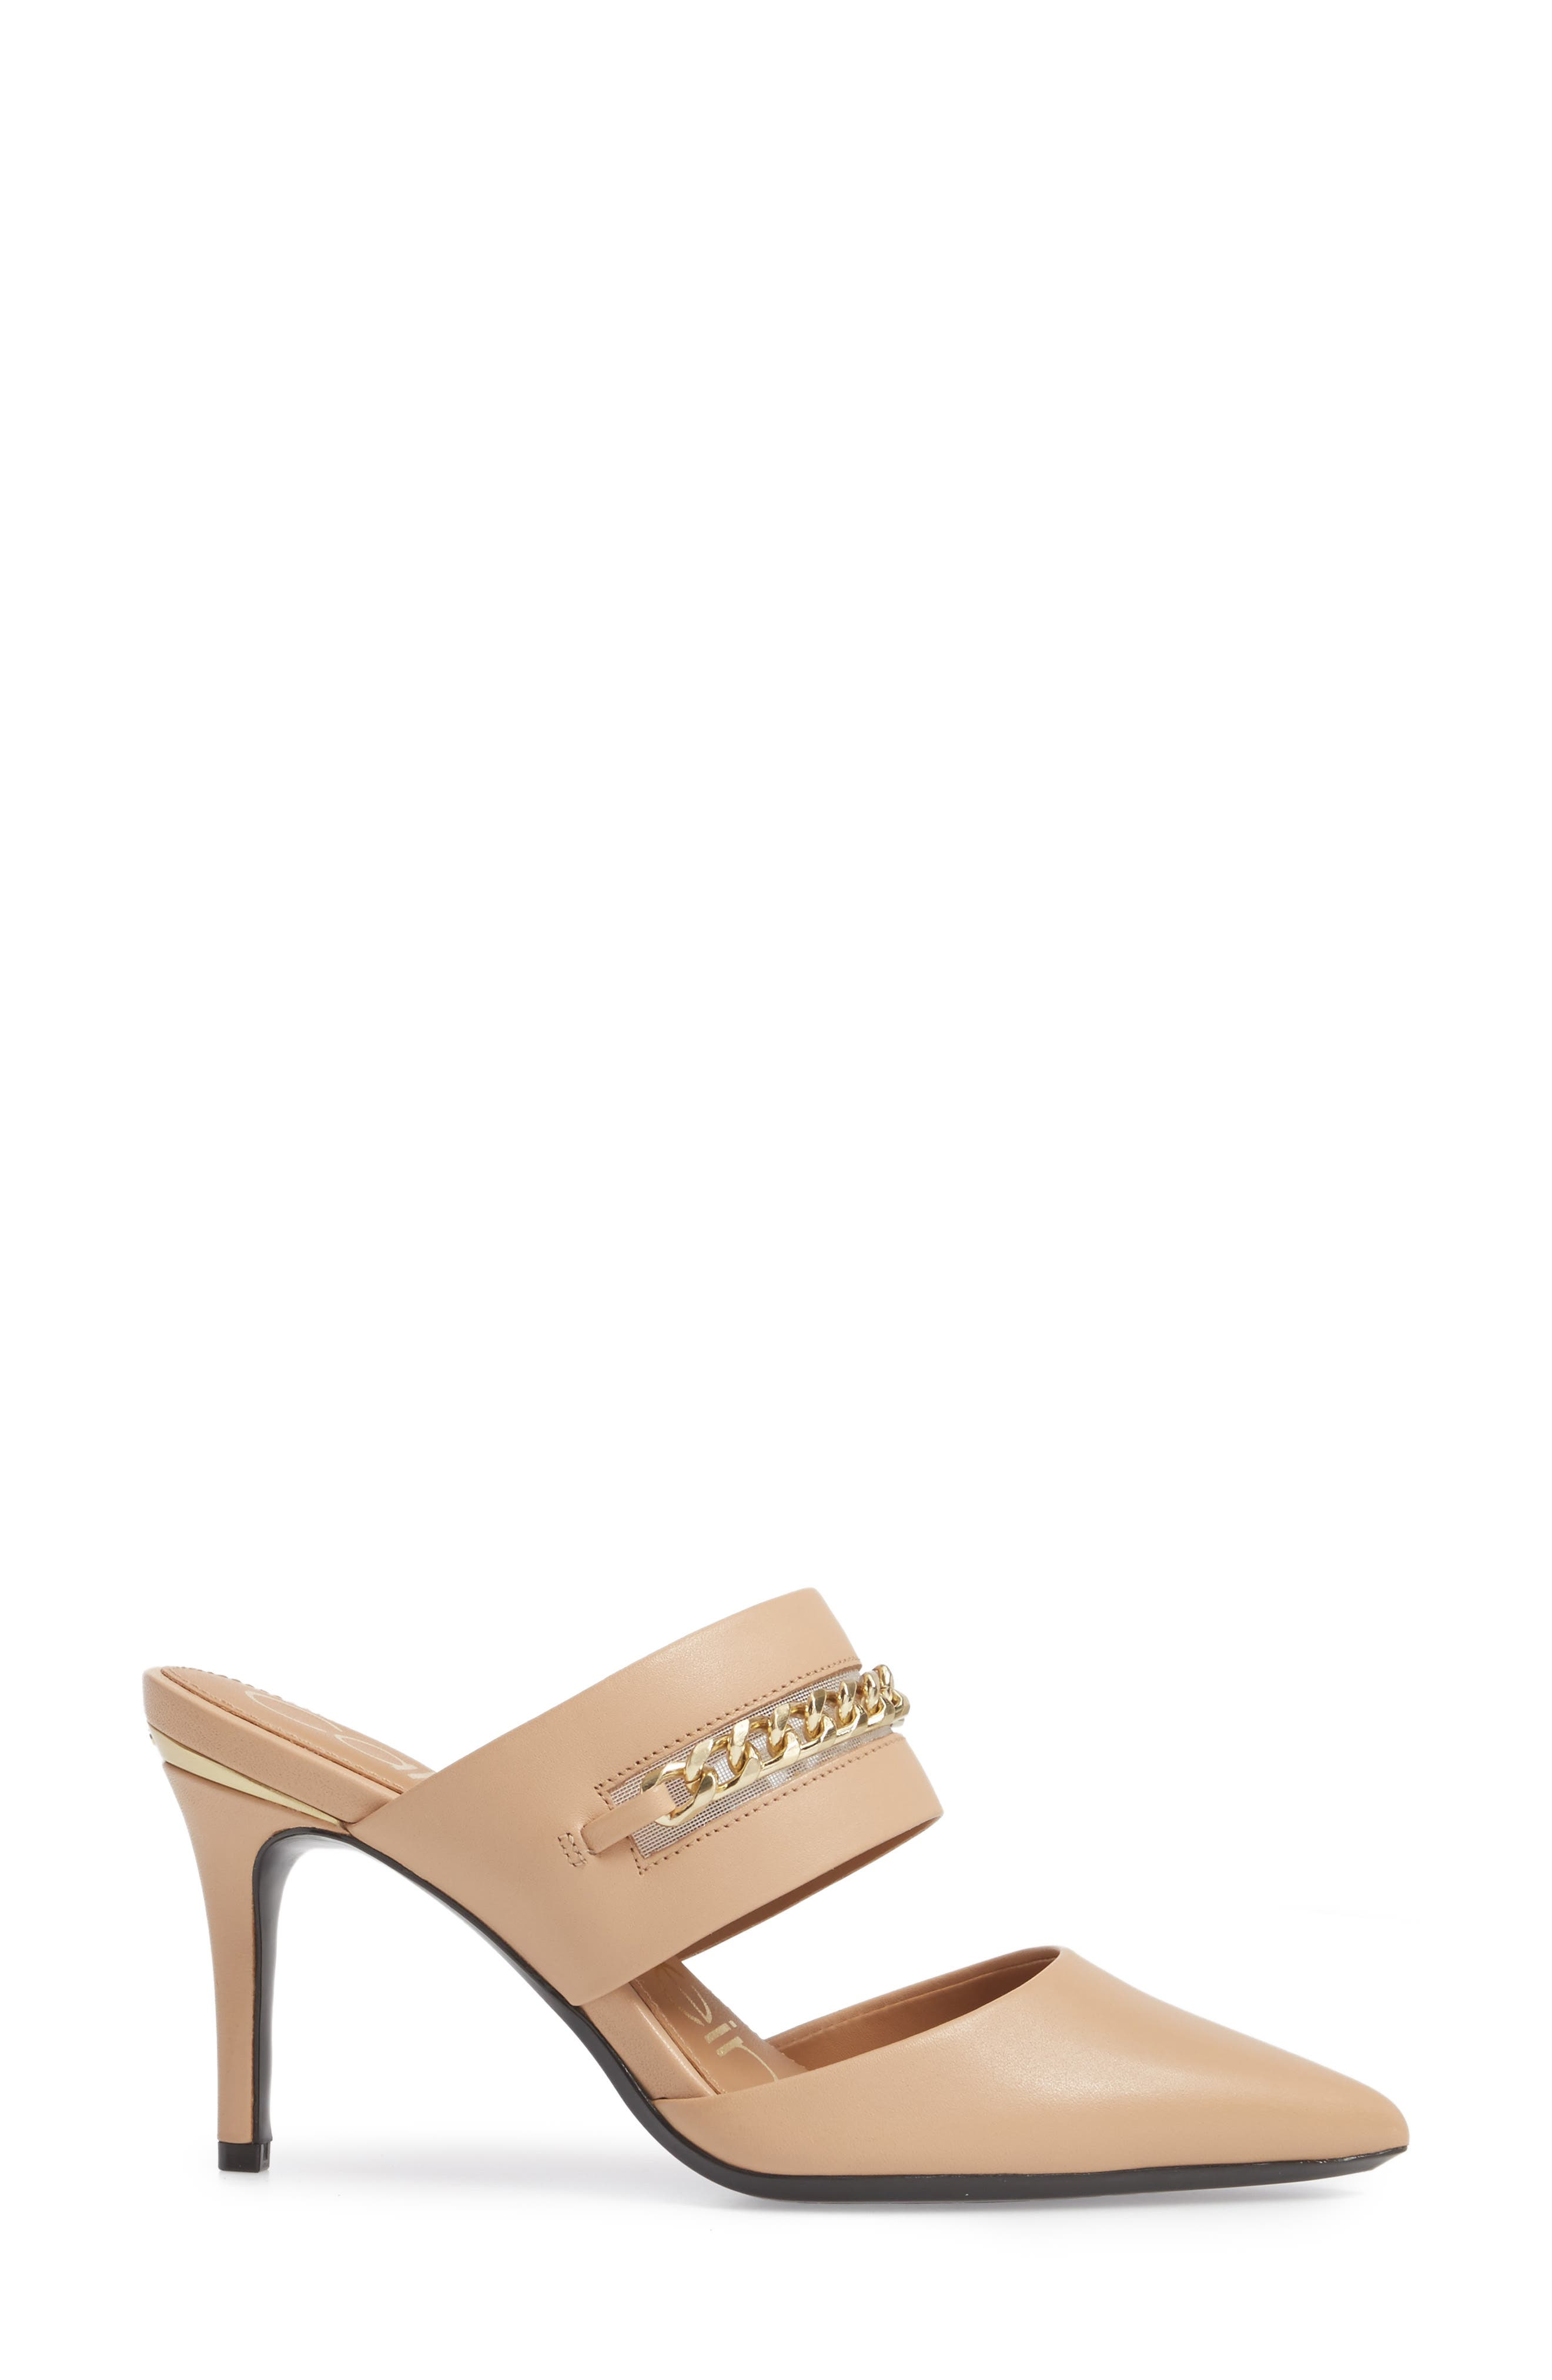 Ginette Embellished Pointy Toe Mule,                             Alternate thumbnail 3, color,                             Sandstorm Leather